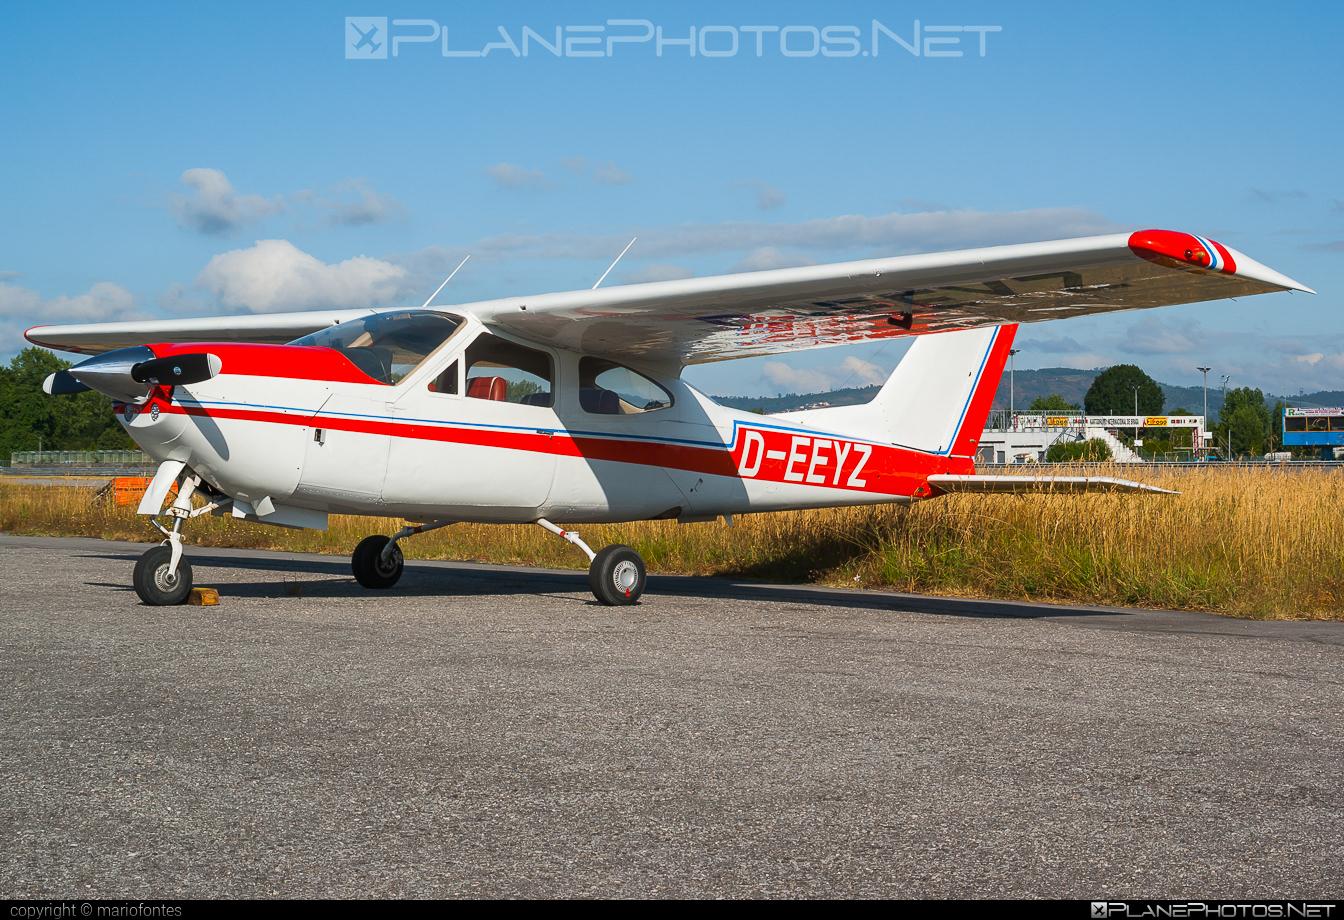 Reims F177RG Cardinal RG - D-EEYZ operated by Private operator #177rg #cardinalrg #cessnacardinal #f177rg #reims #reims177cardinal #reimsf177 #reimsf177rg